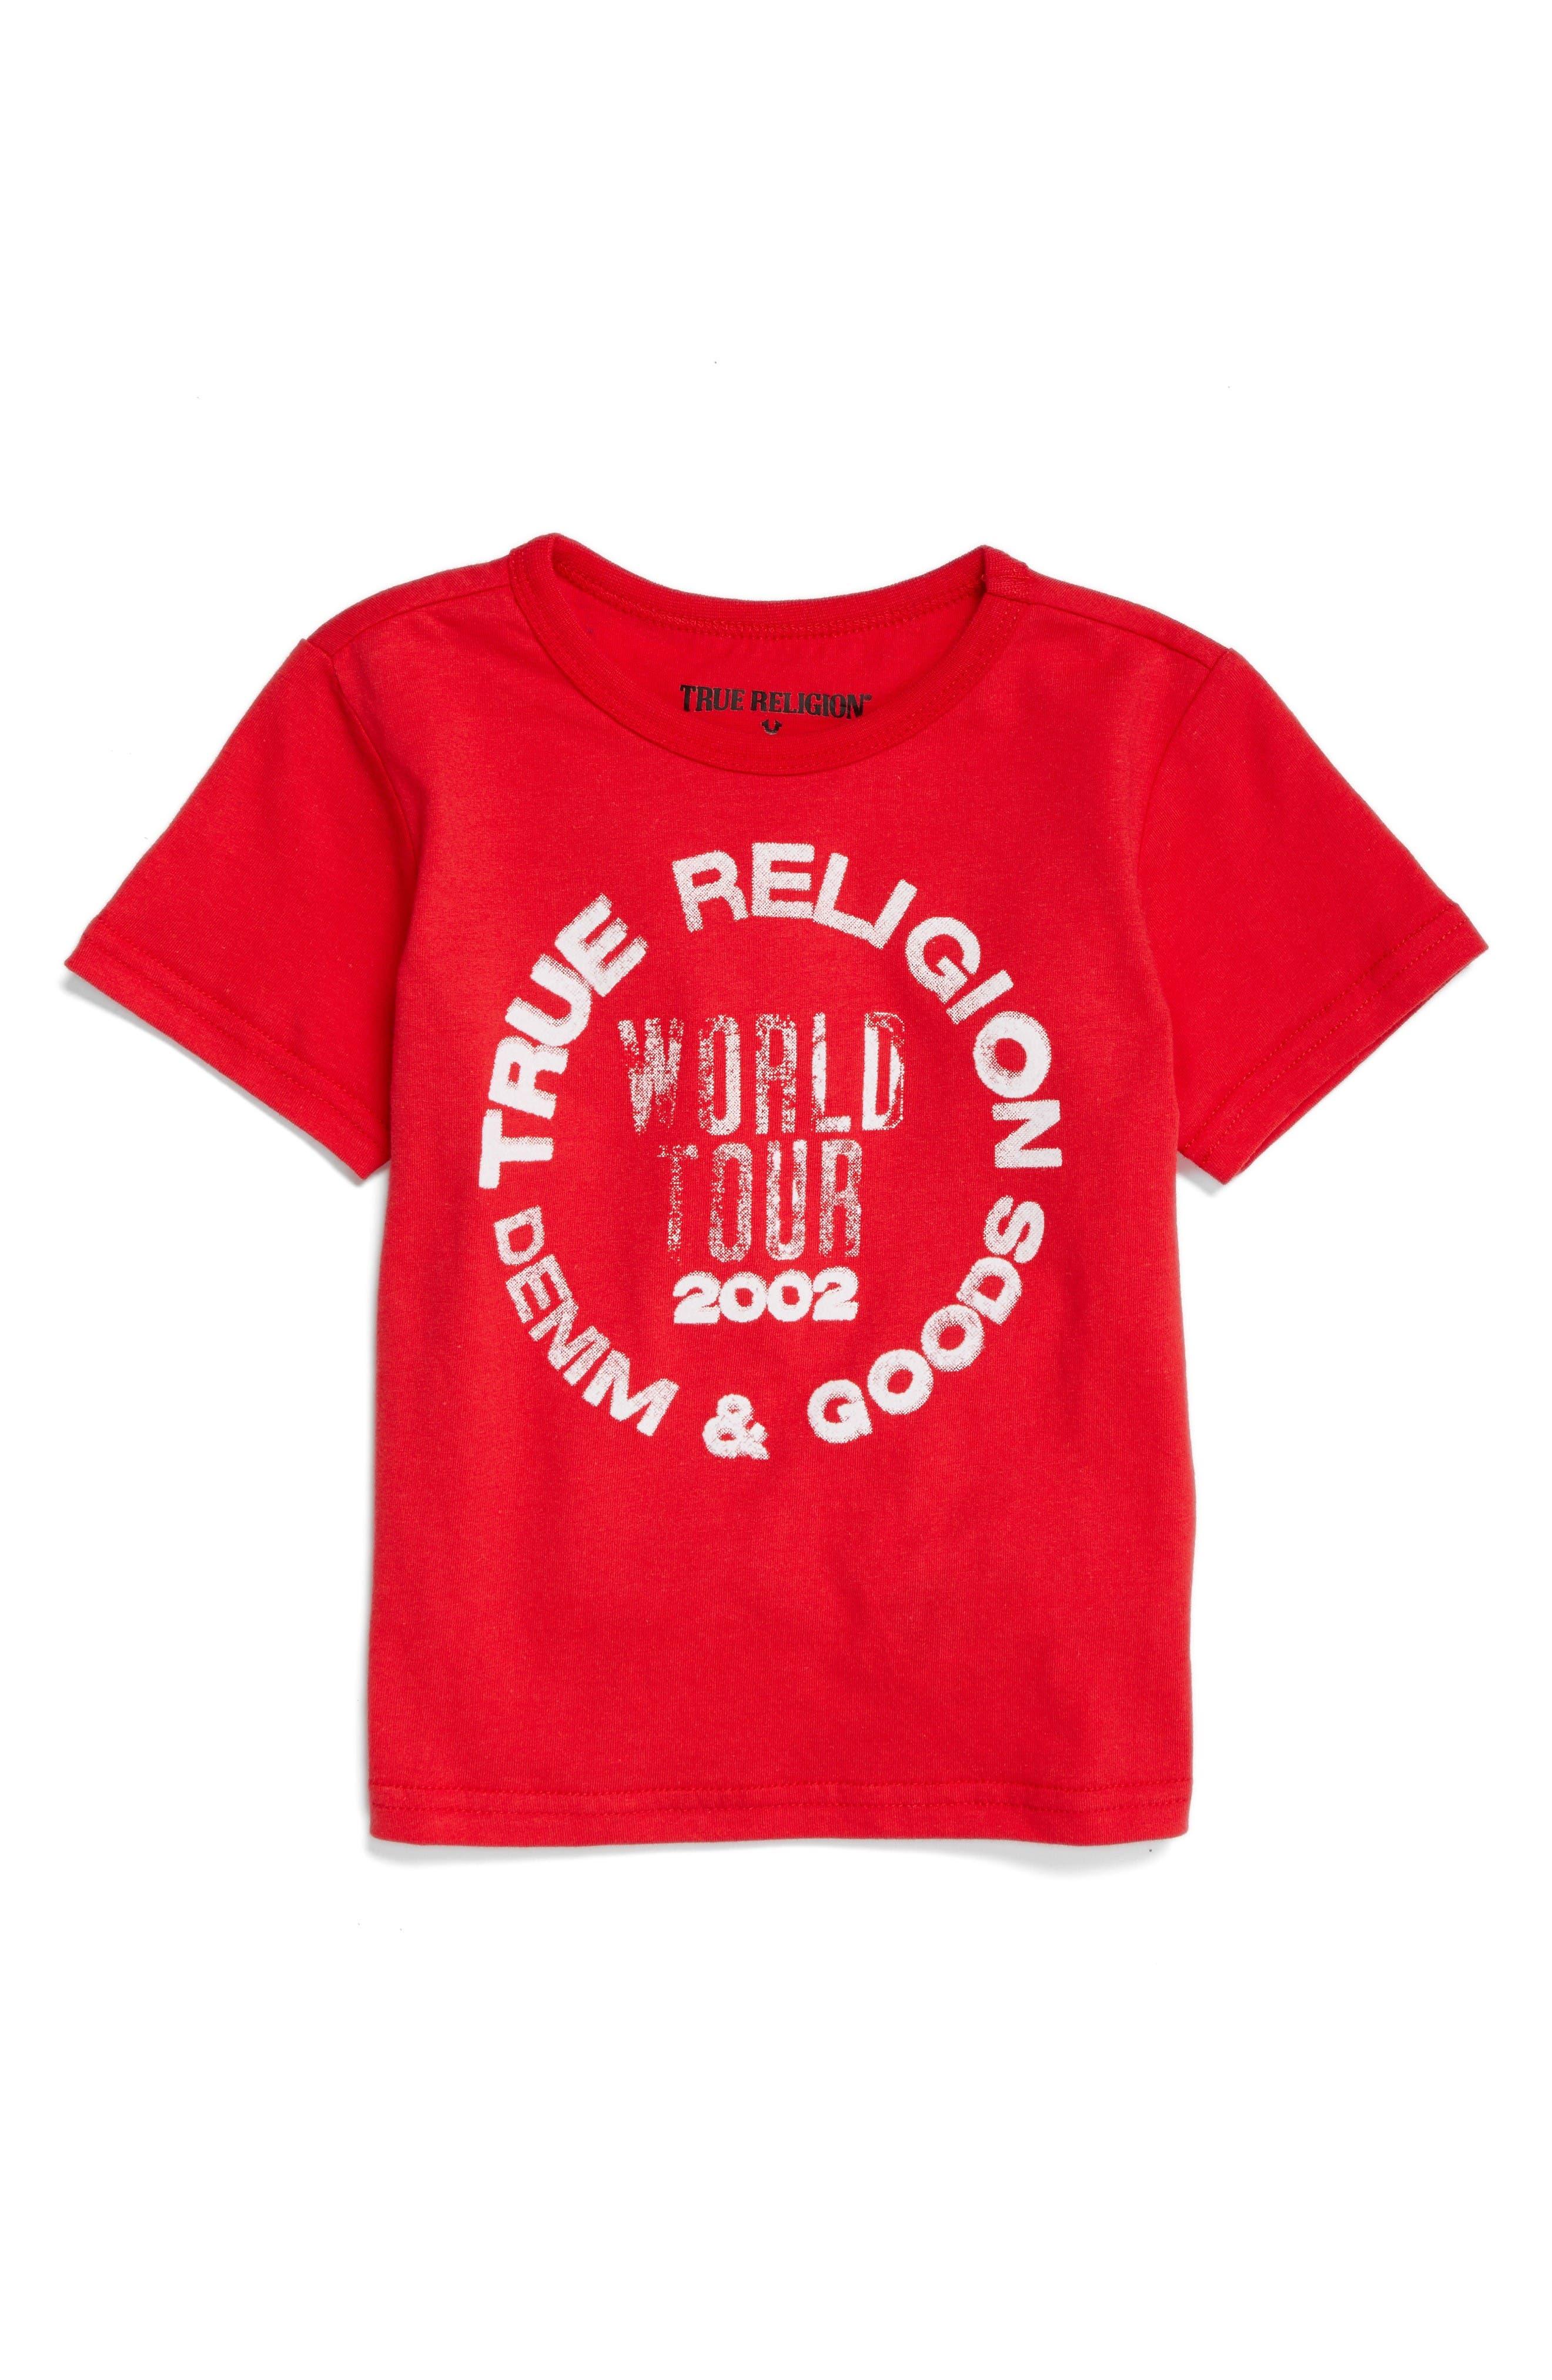 True Religion Denim Goods Graphic T-Shirt (Baby Boys)